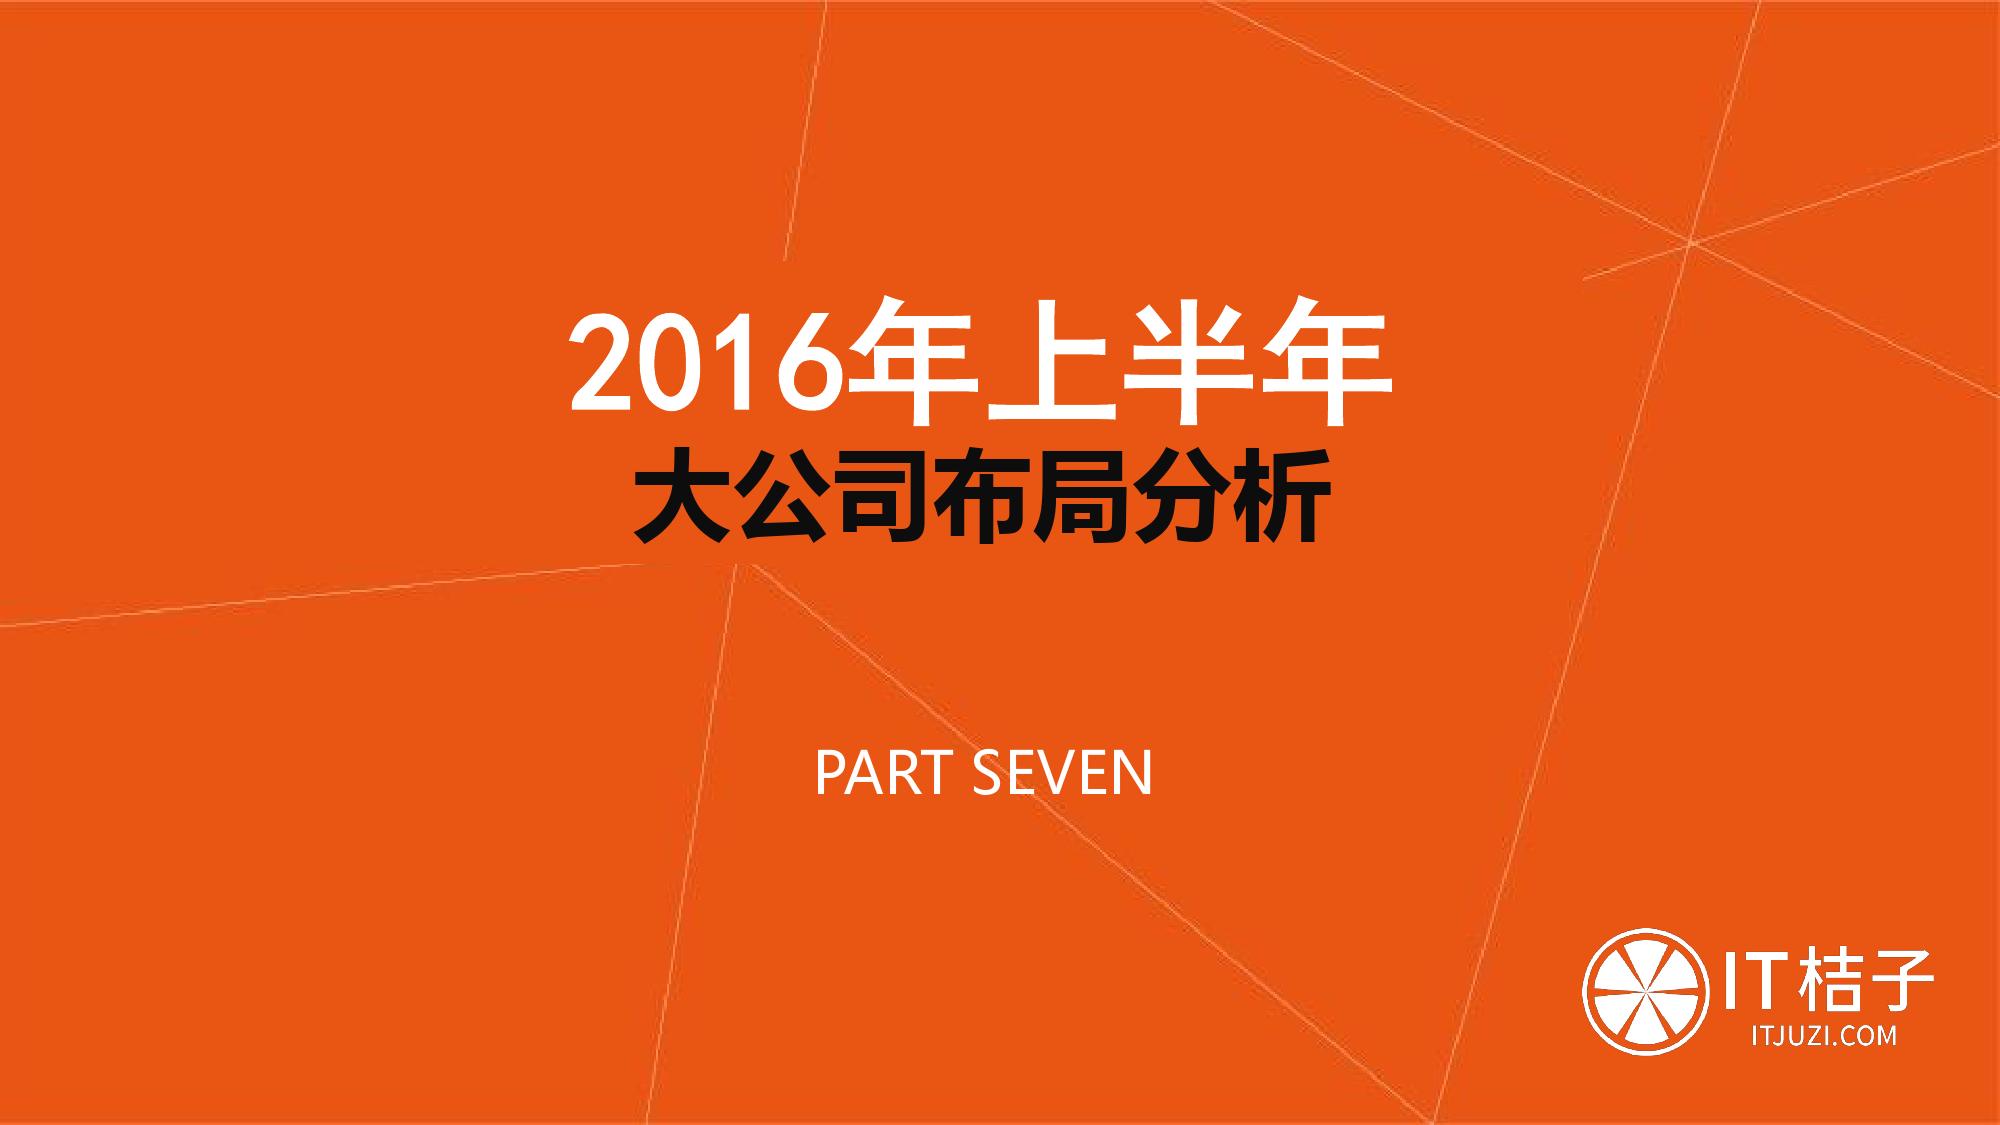 【IT桔子】2016年Q2中国互联网创业投资分析报告_000062